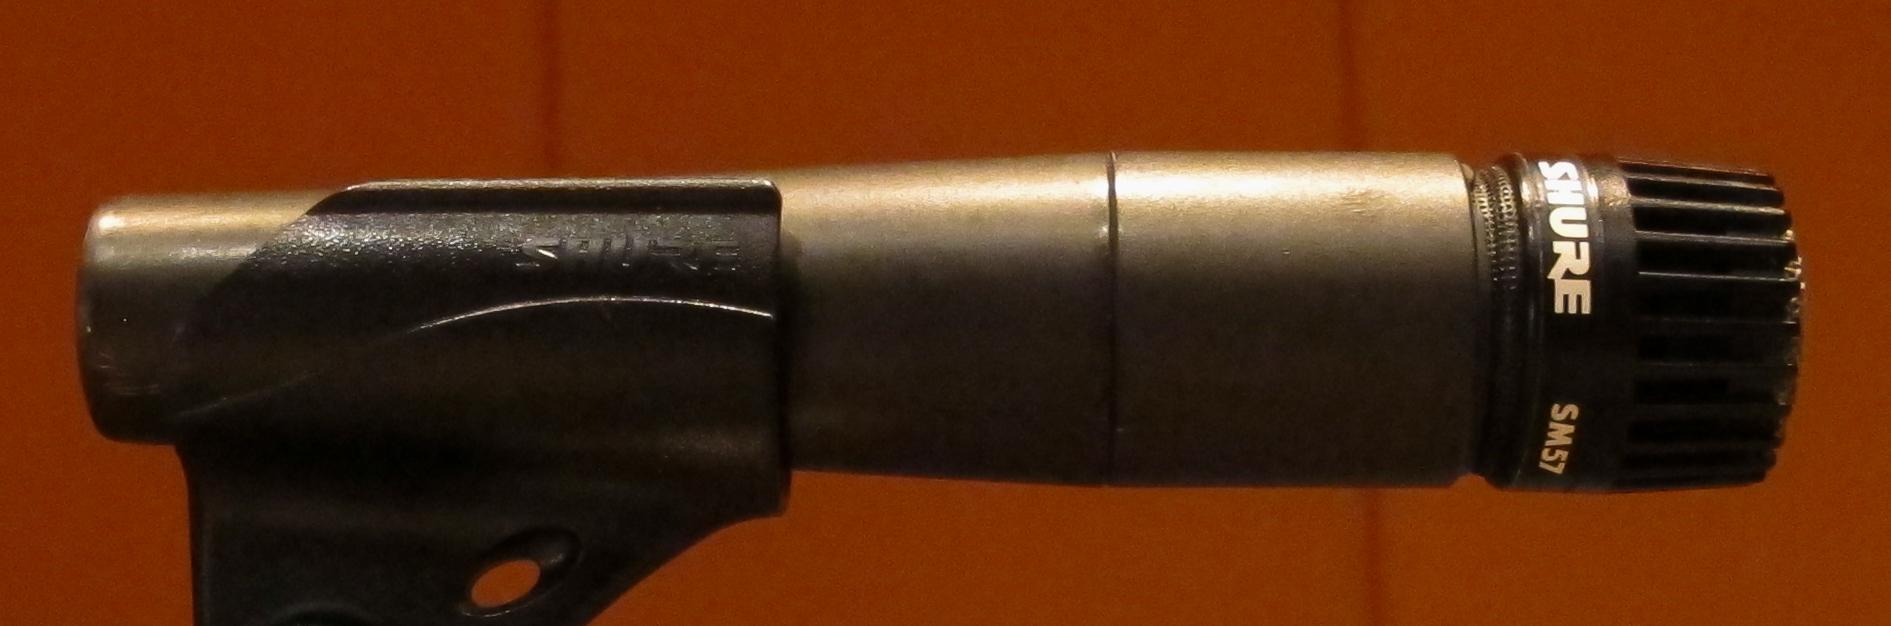 IMG_2896